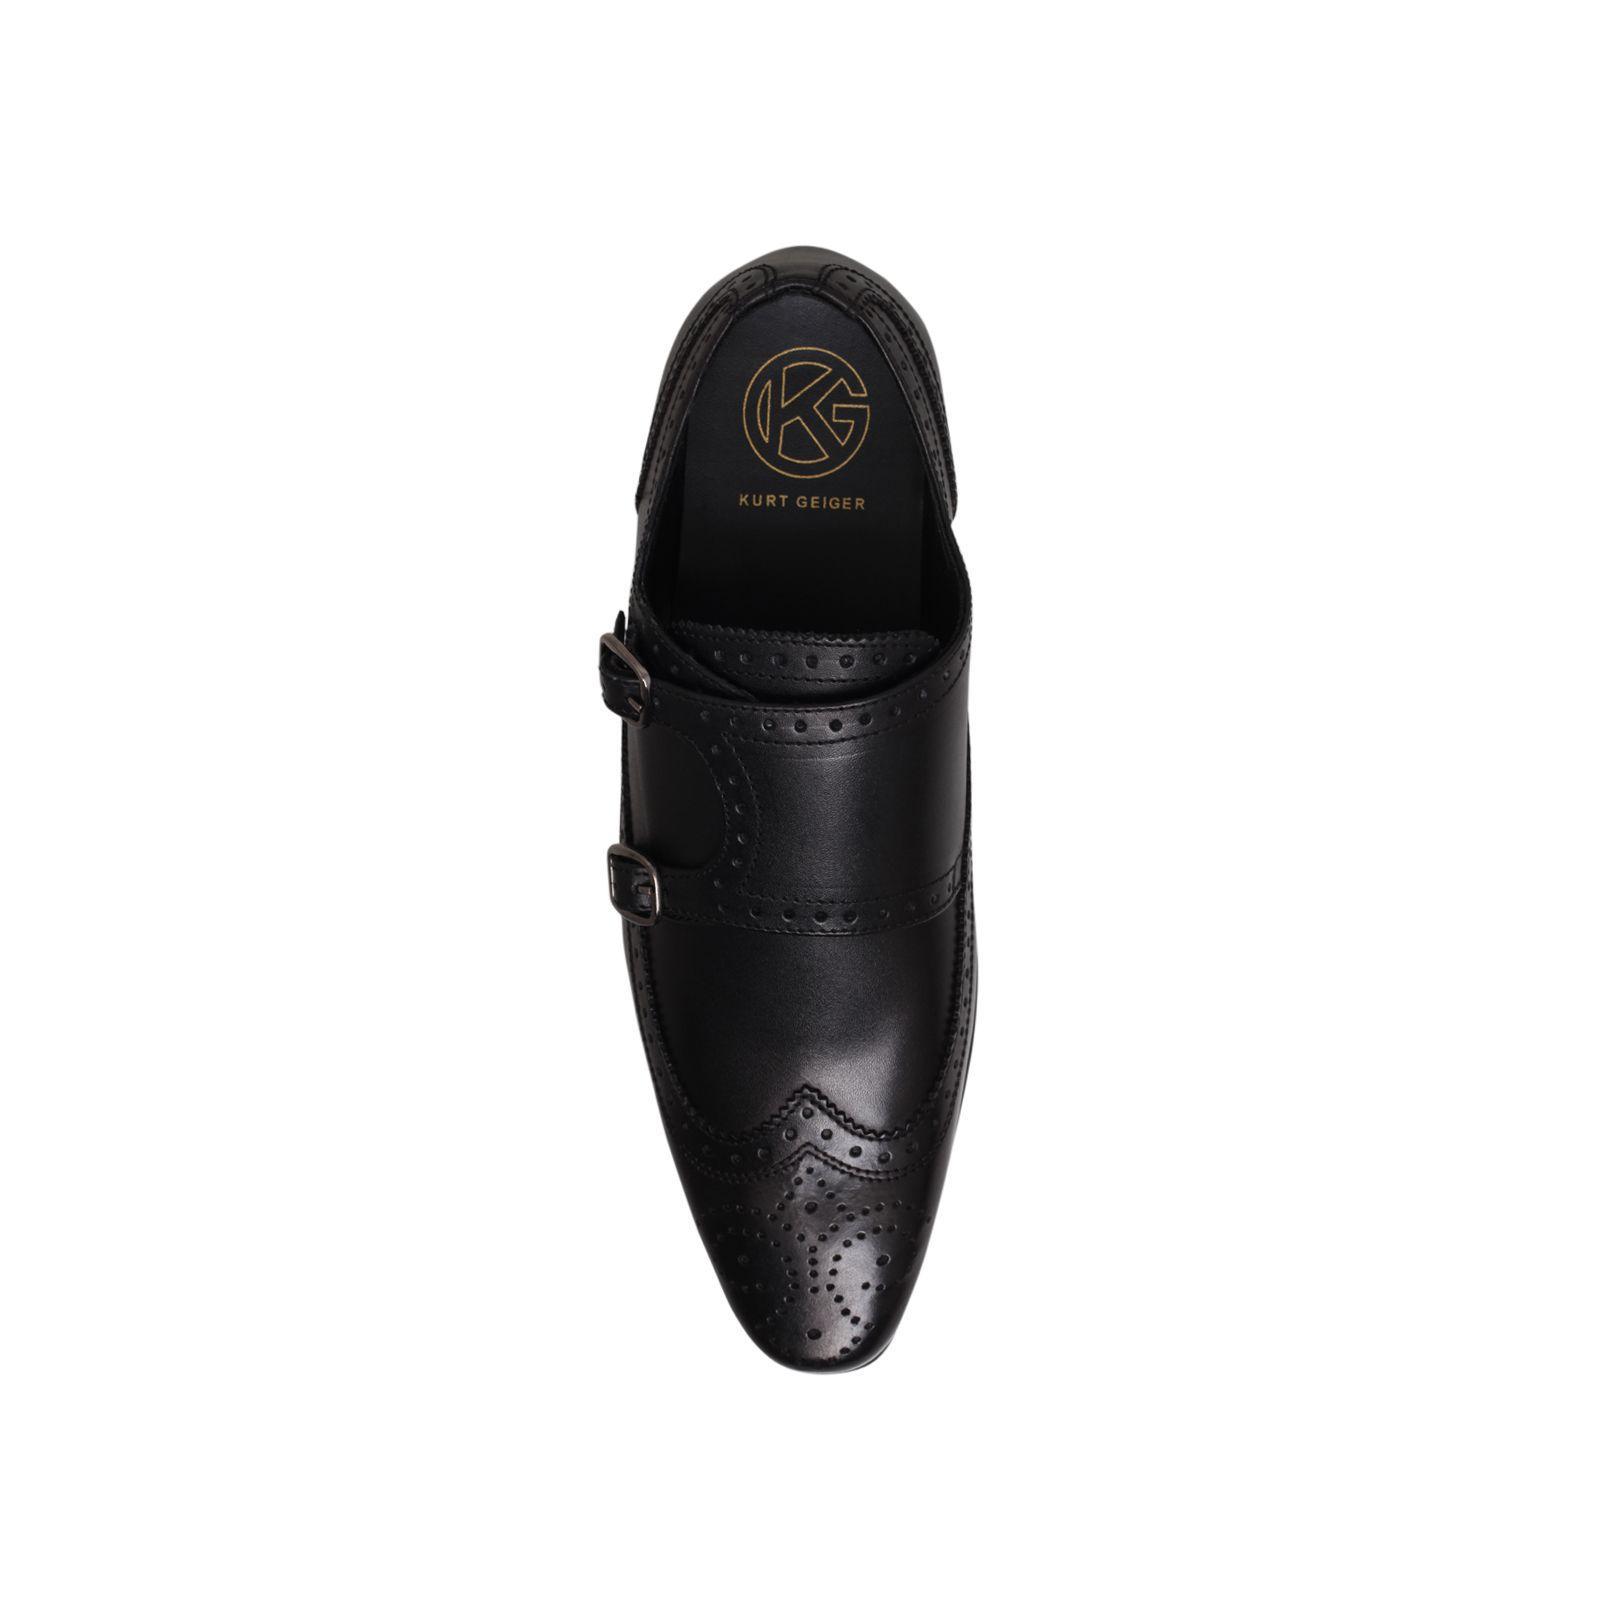 KG by Kurt Geiger Kurt Geiger Elstree Black Leather Monk Shoes for Men